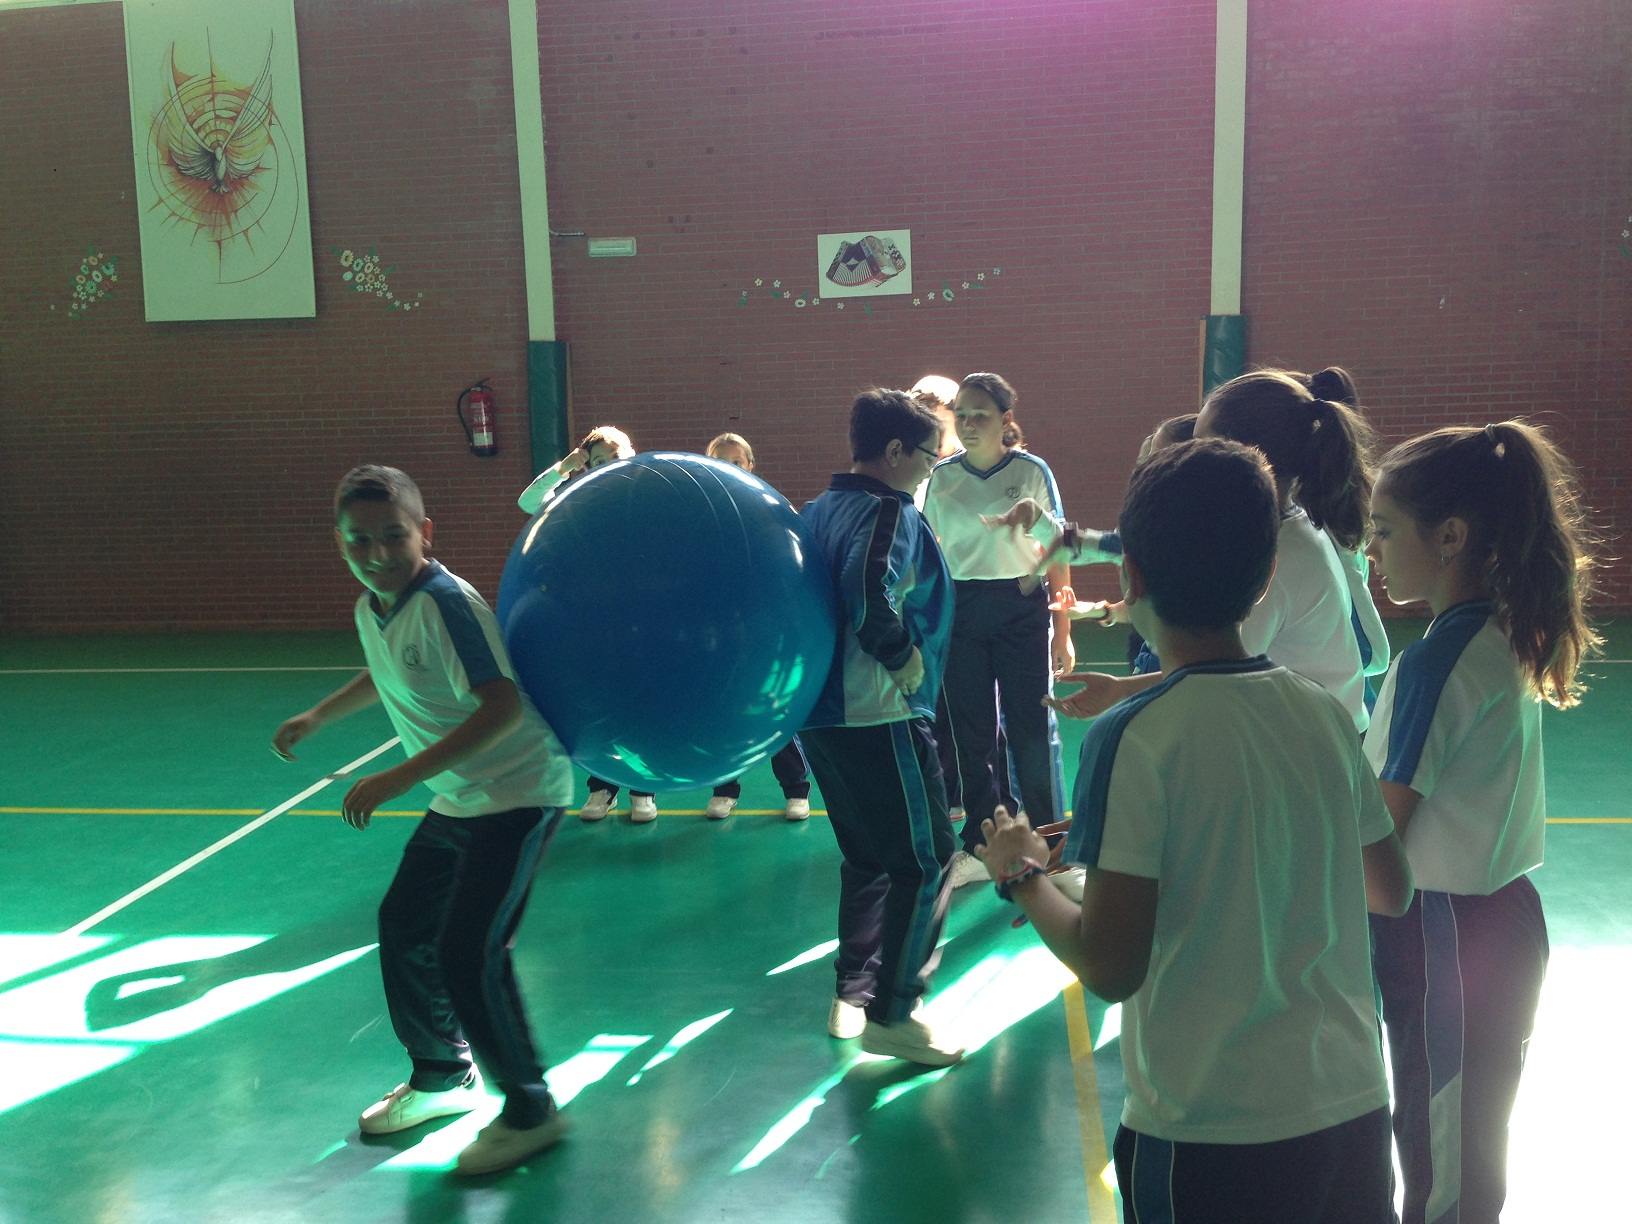 Juego con pelotas gigantes en Educación Física.